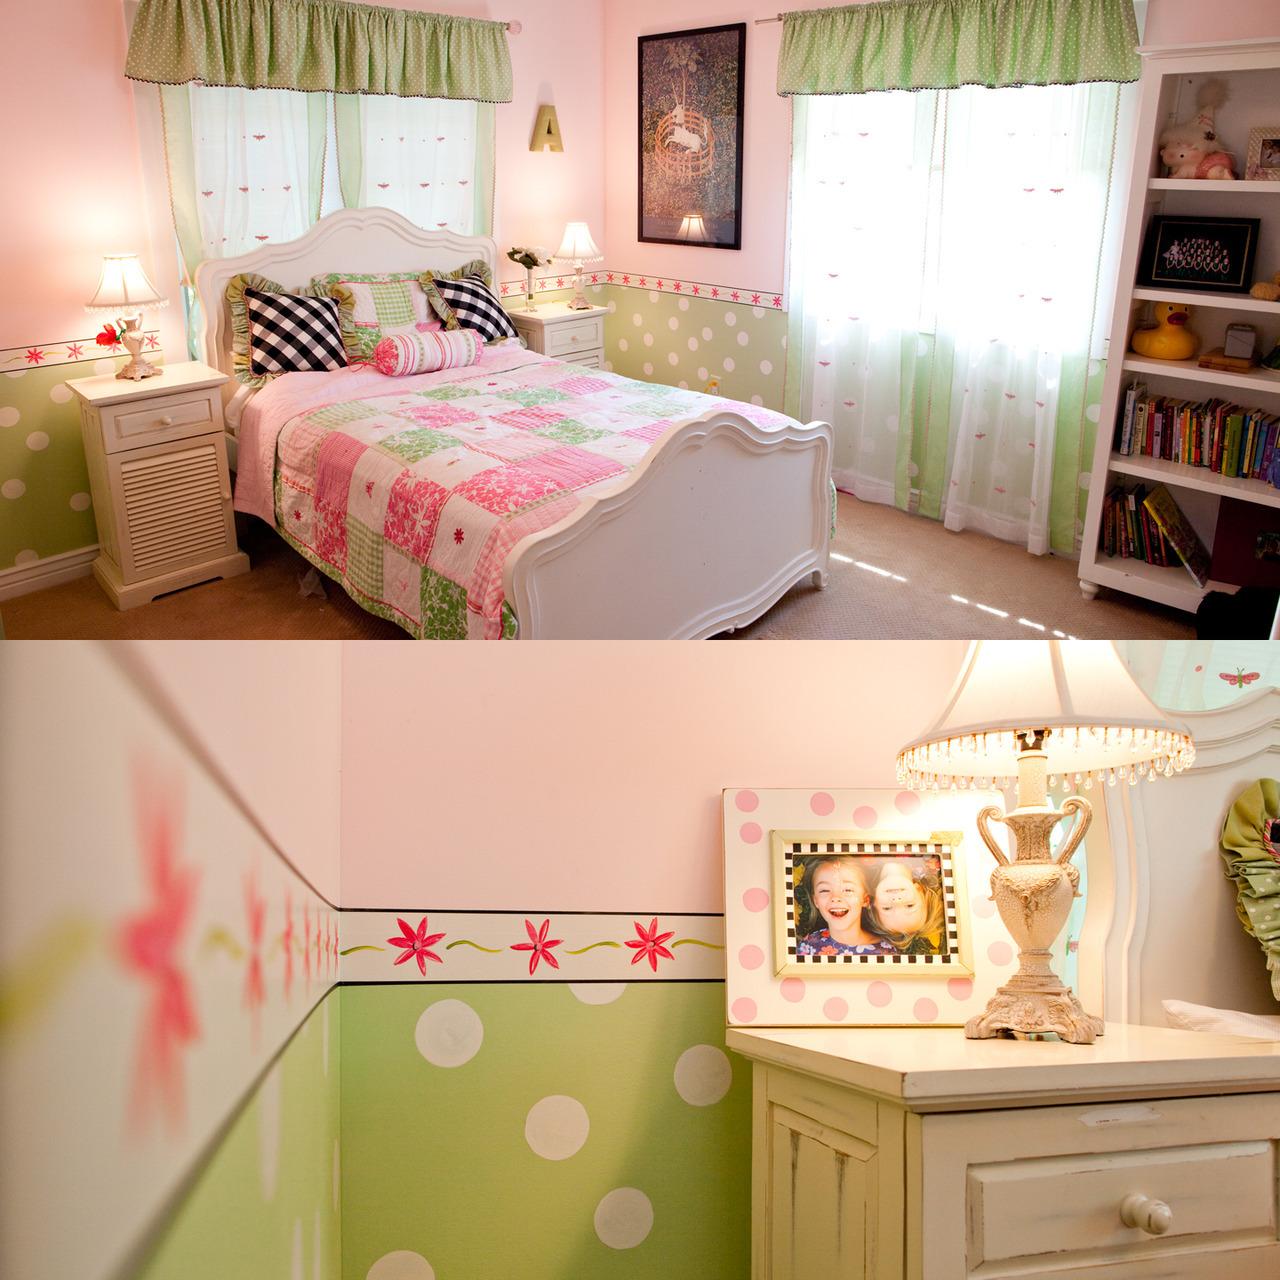 http://25.media.tumblr.com/tumblr_m7ldgtrbK51r8n8aqo1_1280.jpg